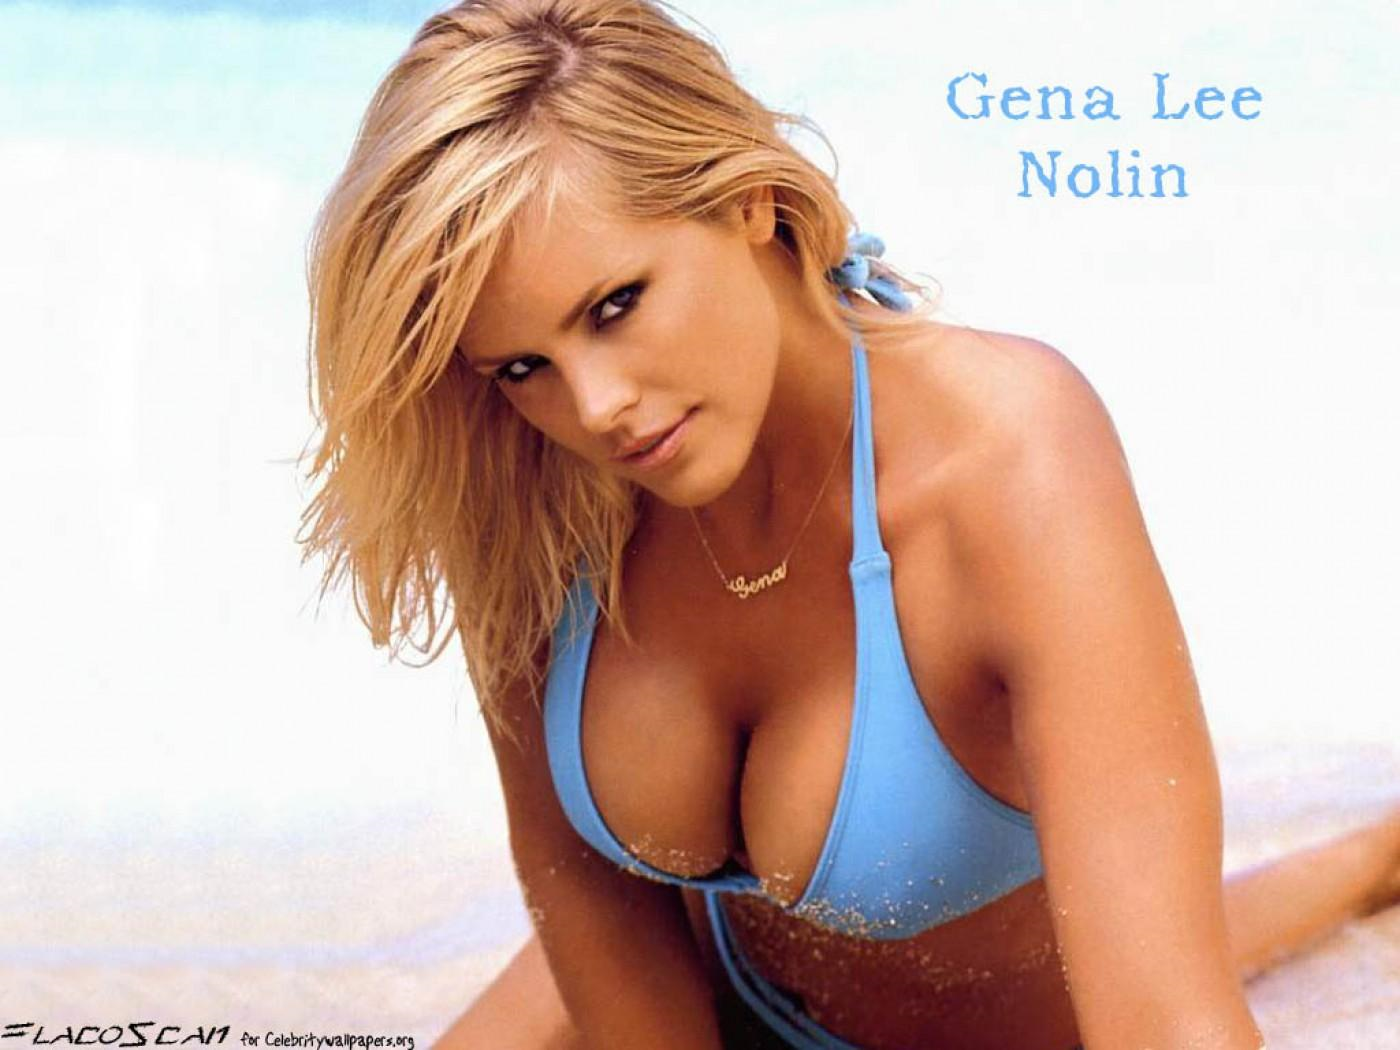 Gena Lee Nolin